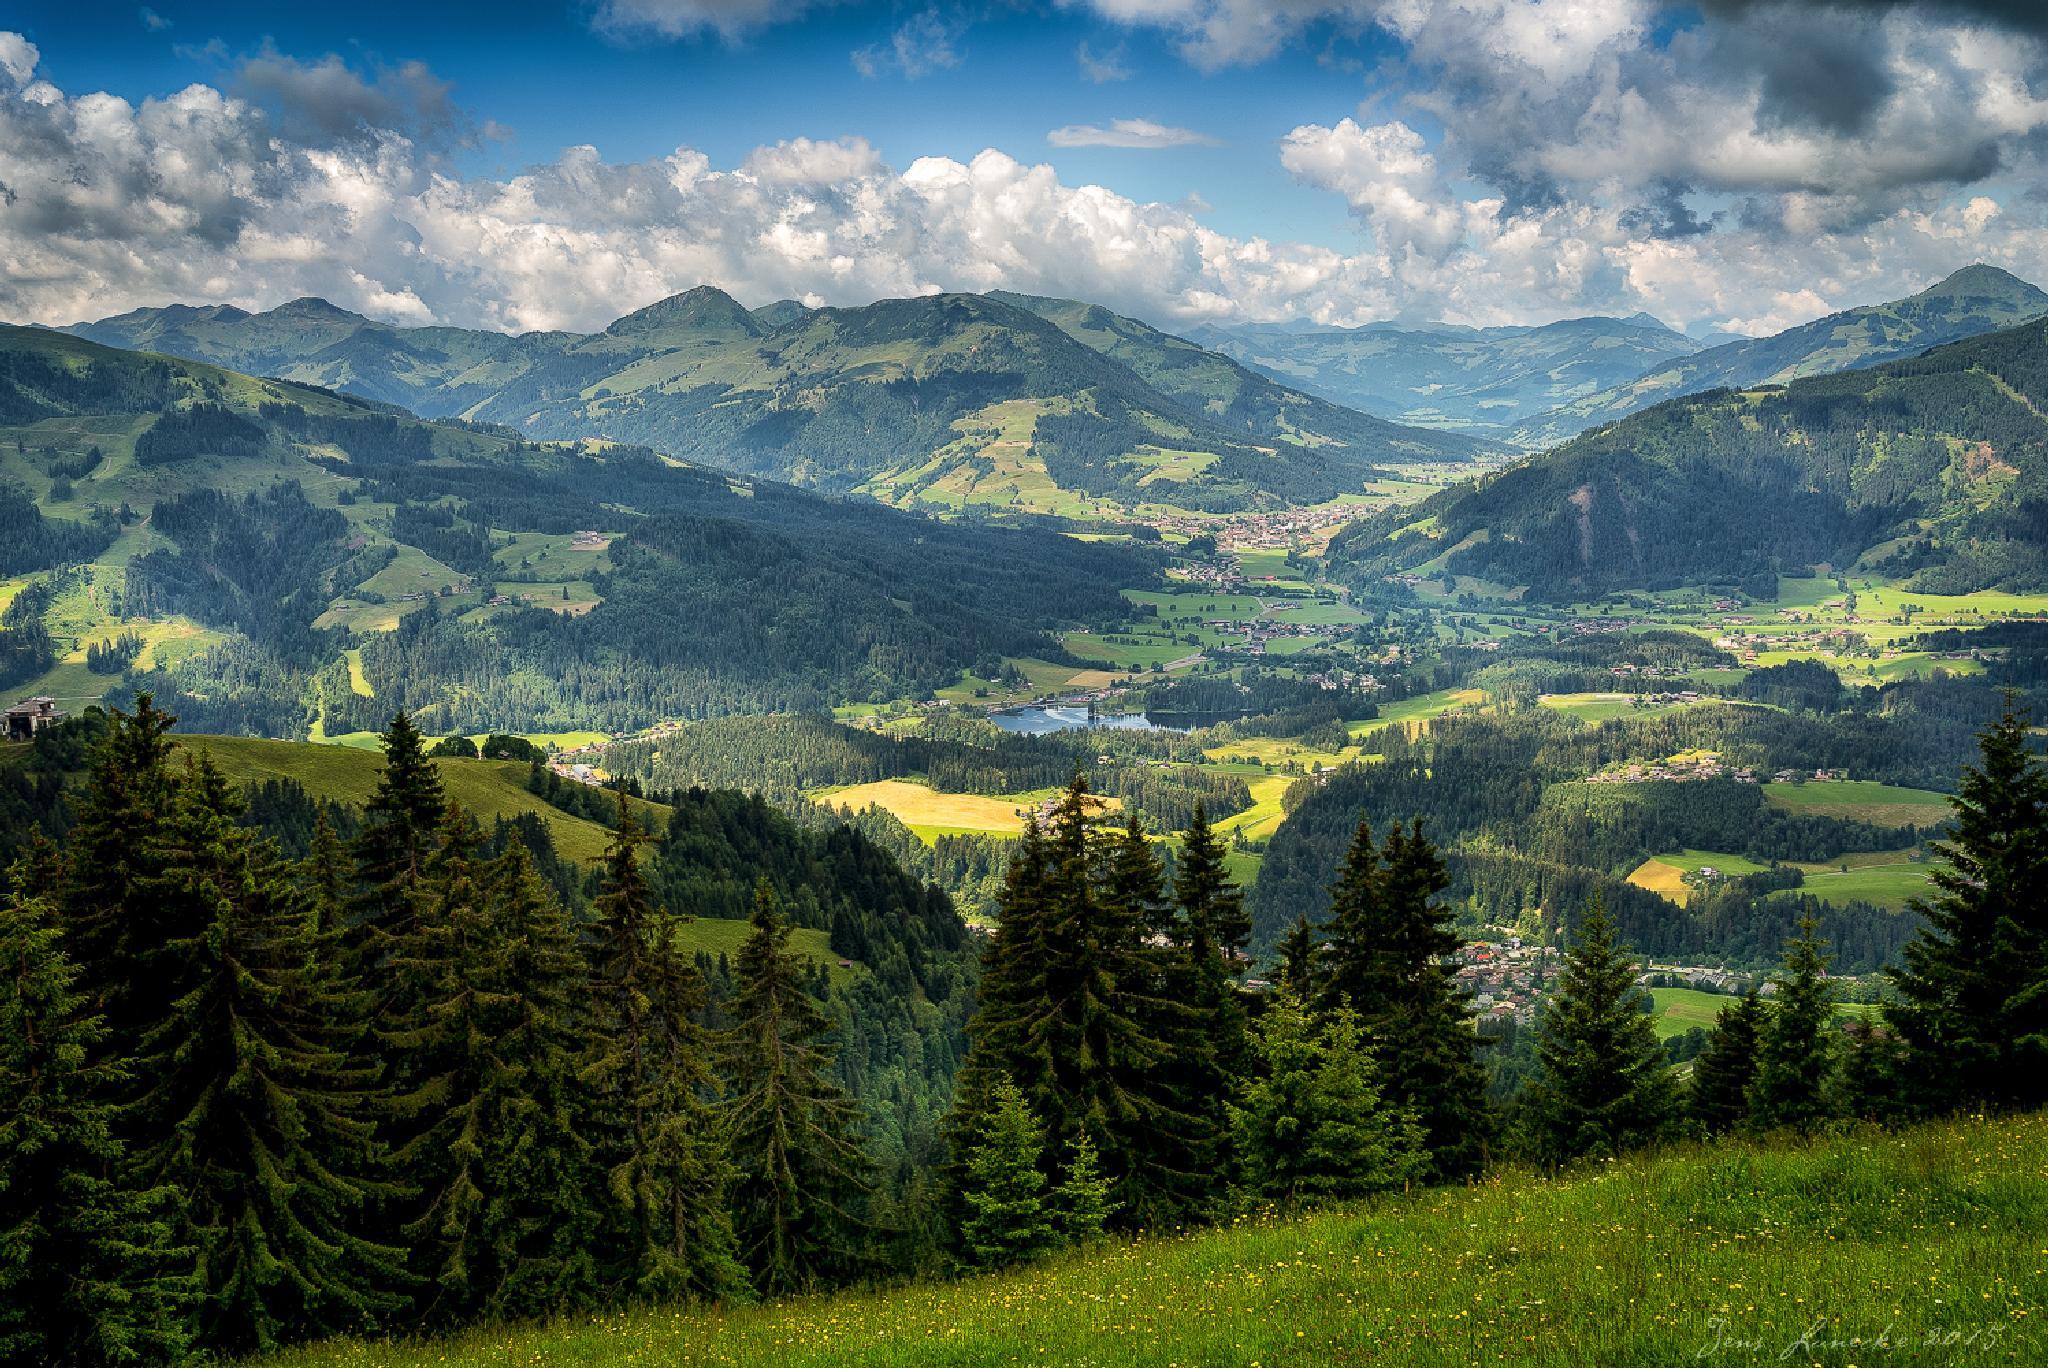 Kitzbühler Alpen, Austria by jlunecke